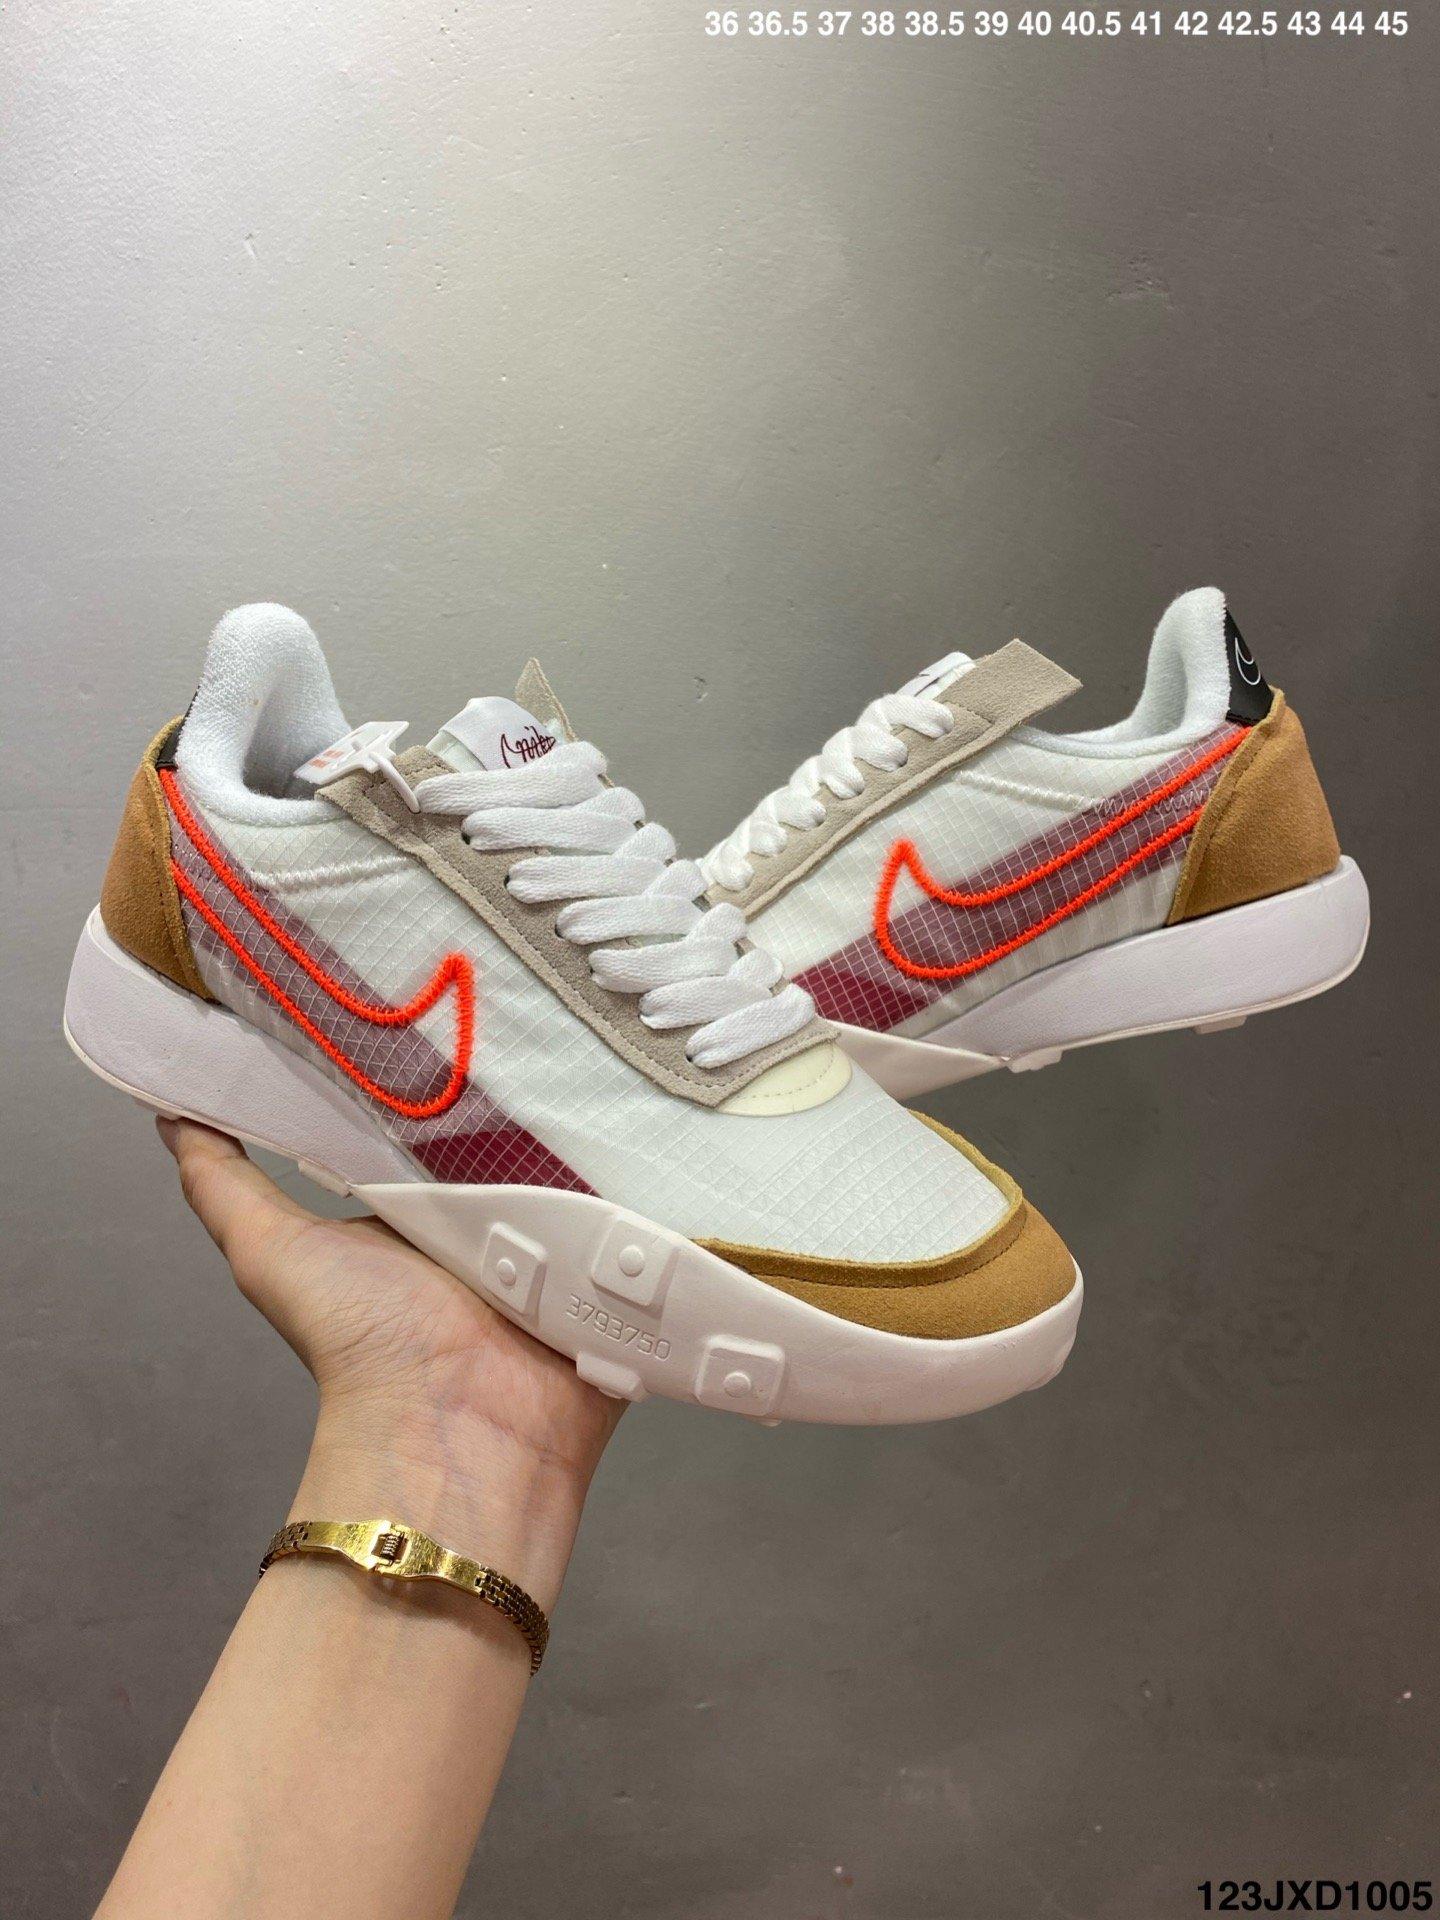 05104726234 - 运动鞋, 跑步鞋, Swoosh, Racer, Nike Waffle Racer 2X